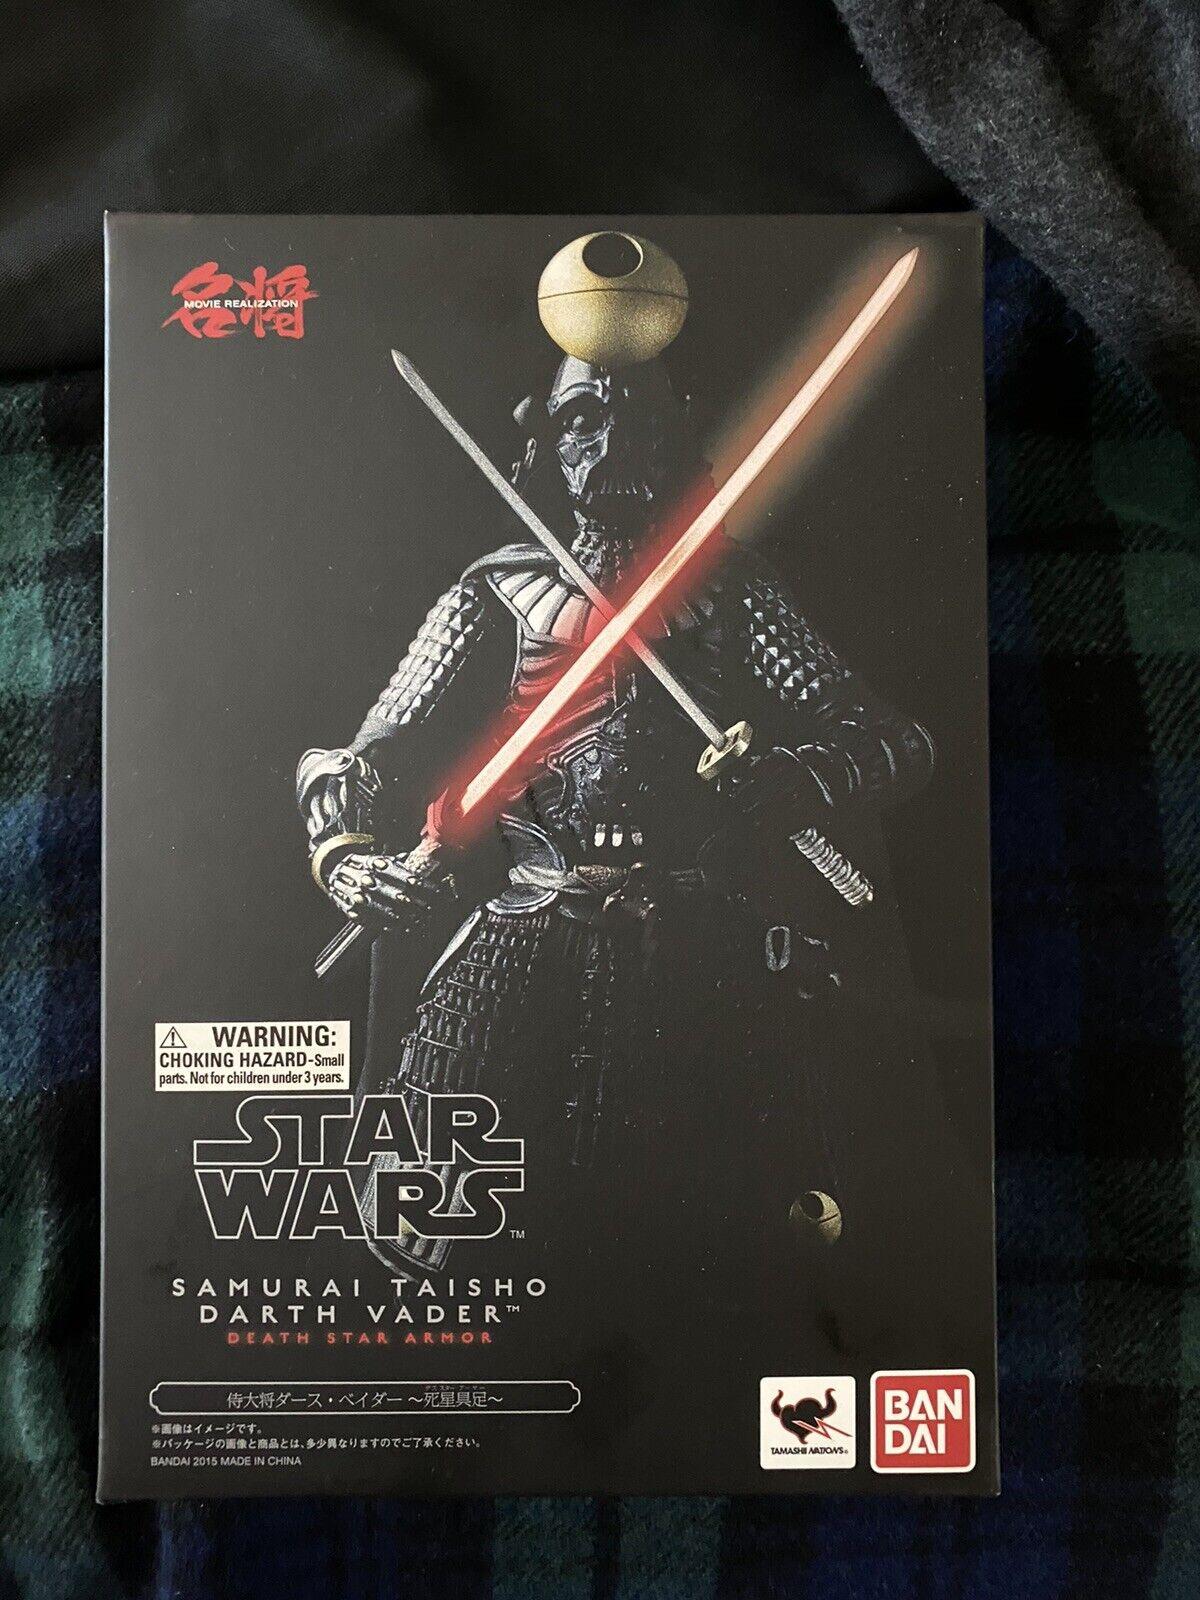 Movie Realization Star Wars Samurai Taisho Darth Vader Death Star Armor